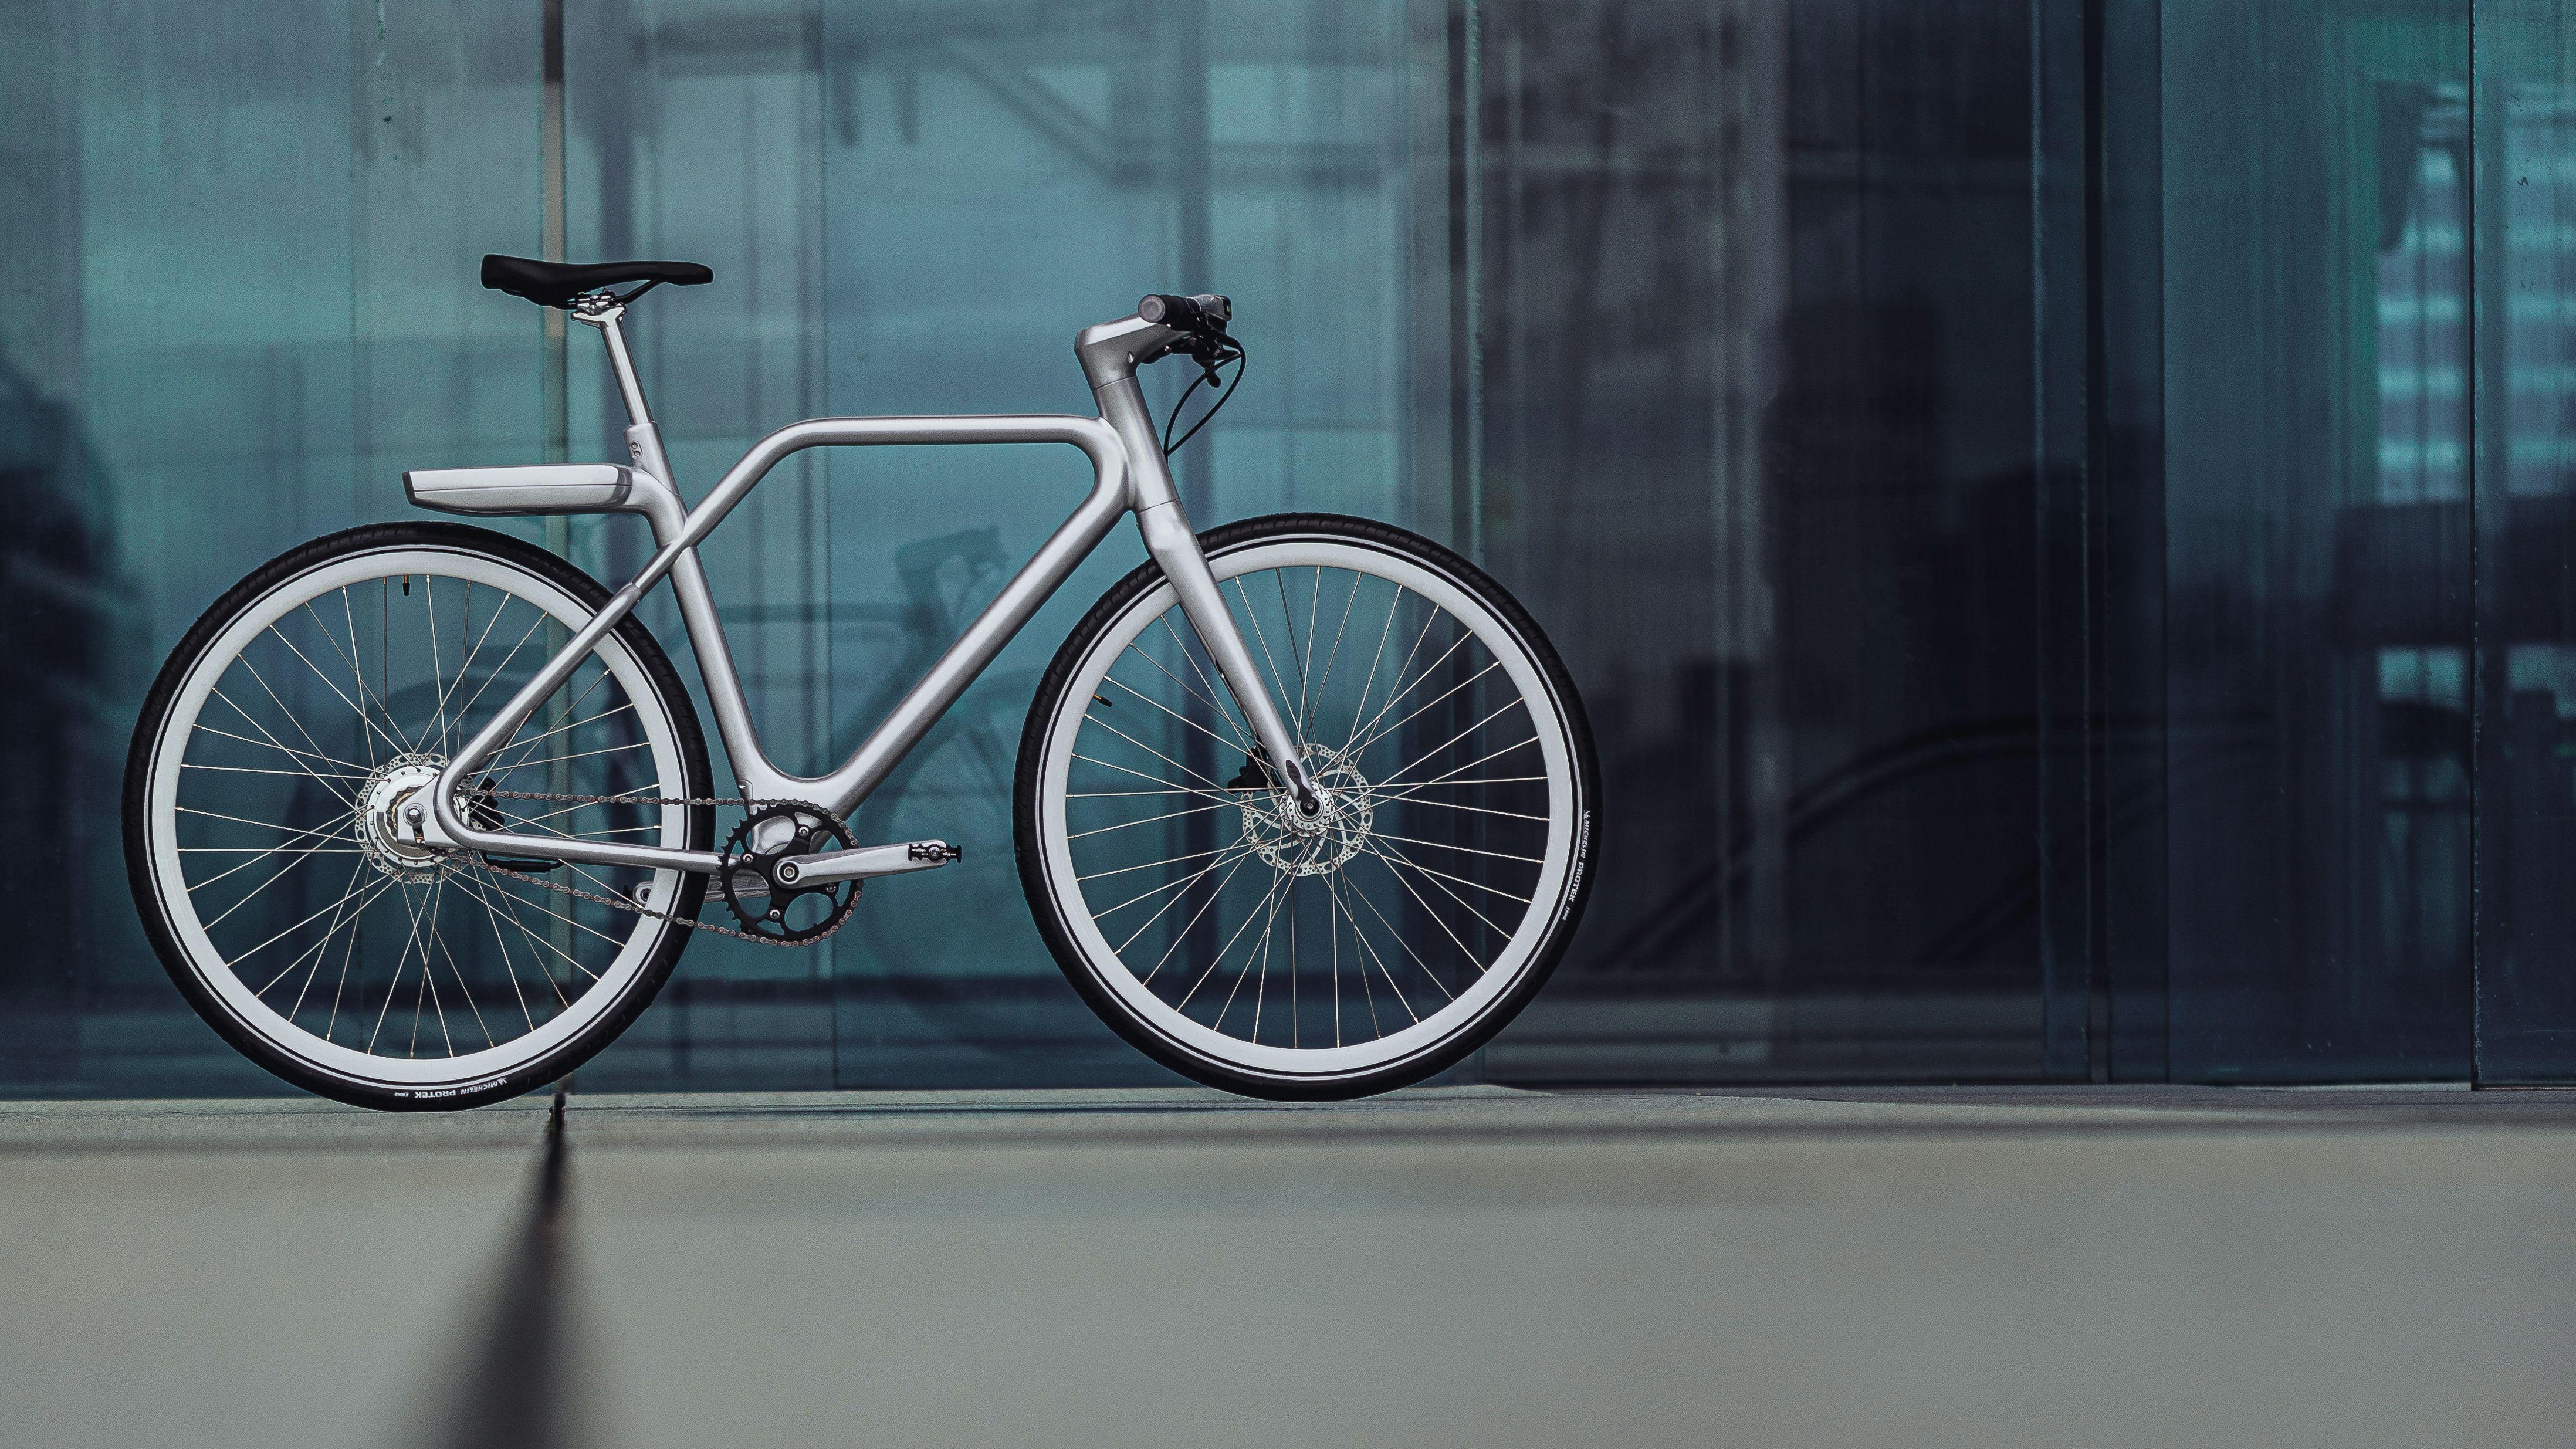 Angell Is A Smart Bike With An Integrated Display Ebike Electric Bike Used Bikes